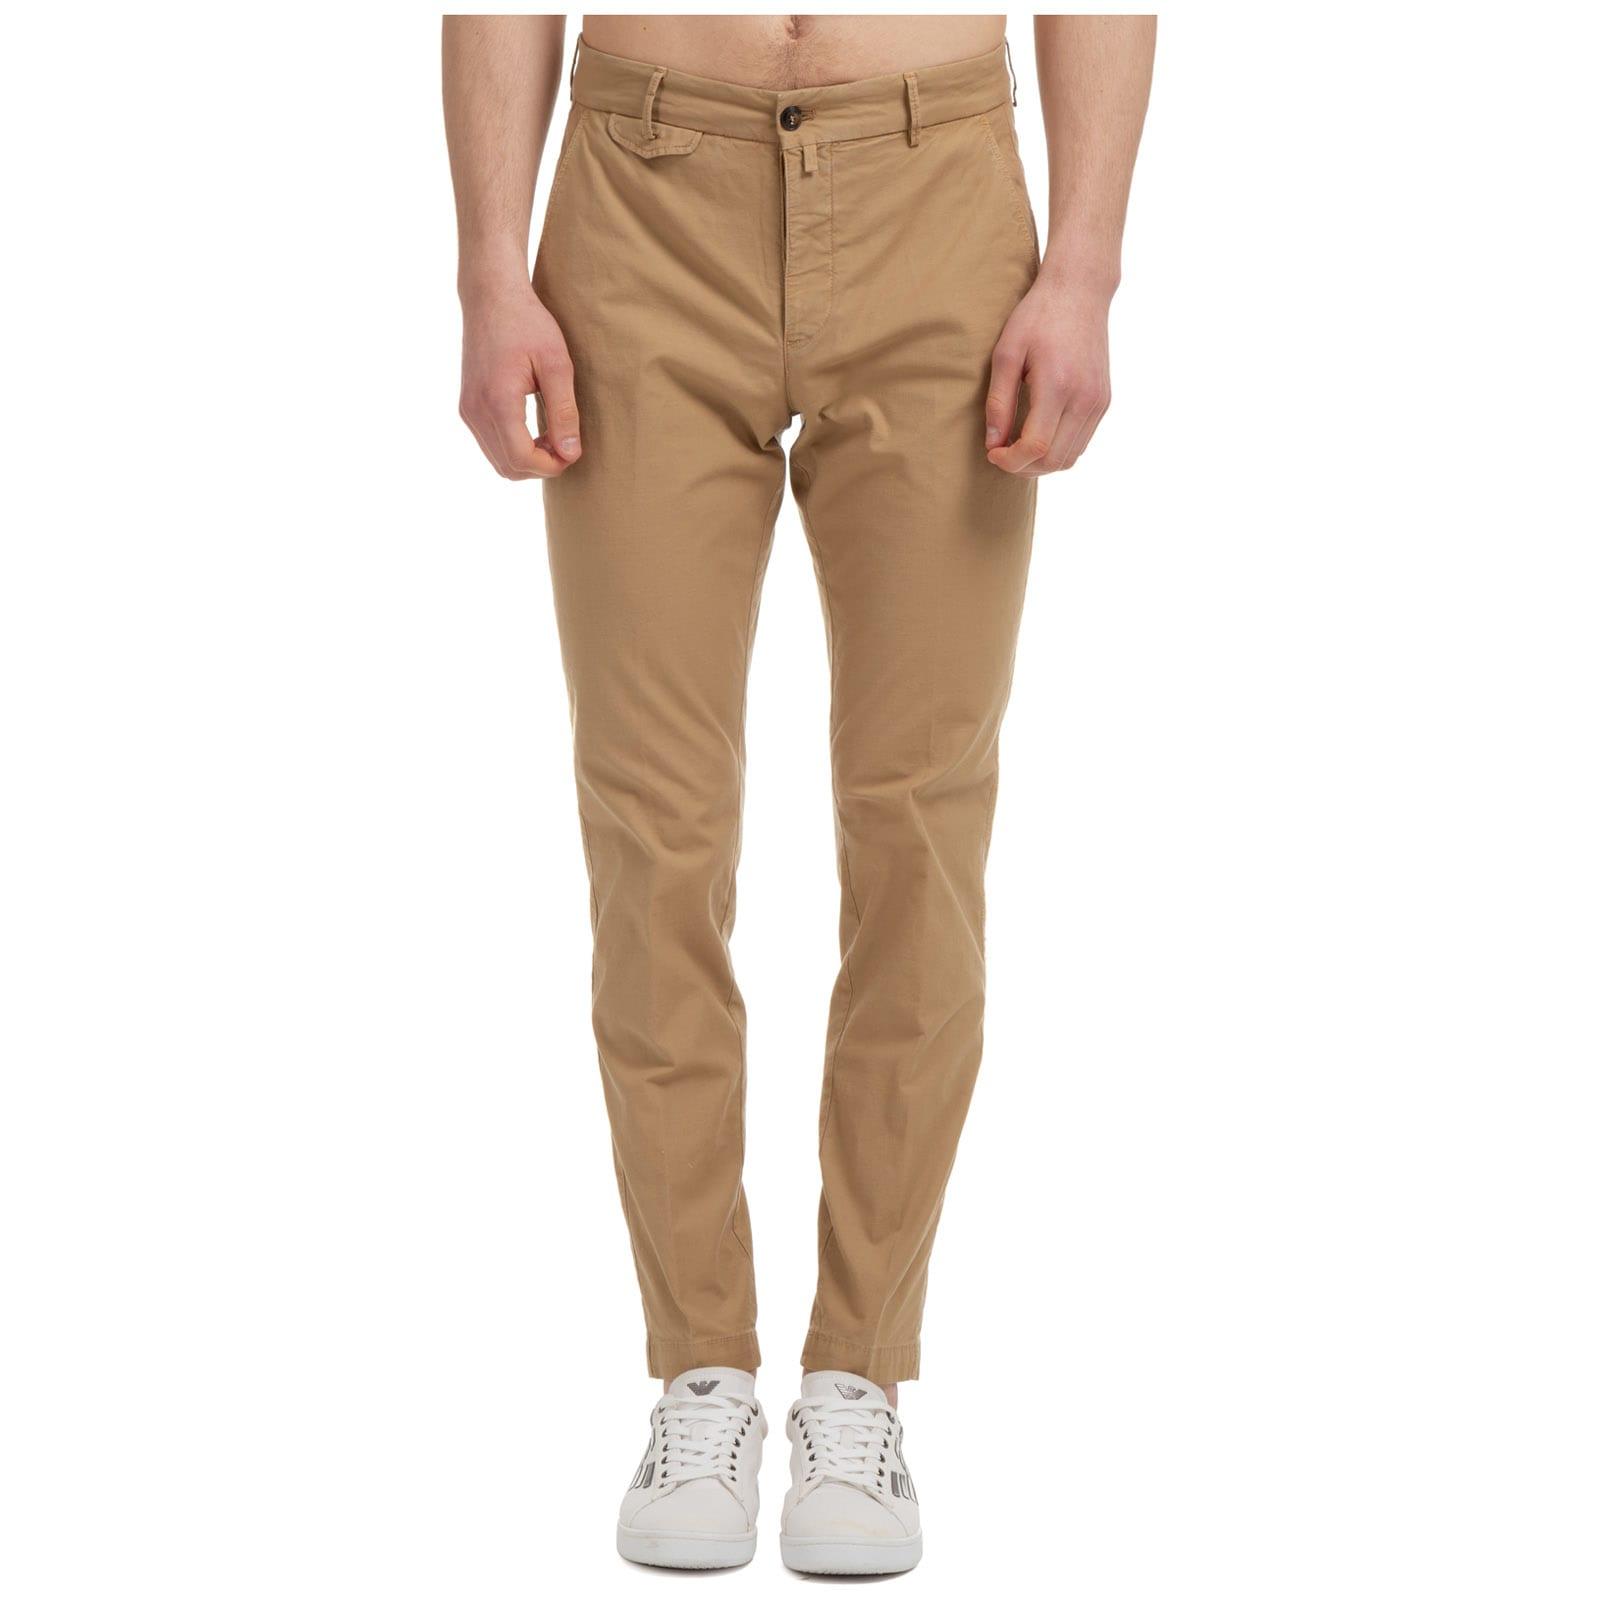 1949 Teddy Trousers